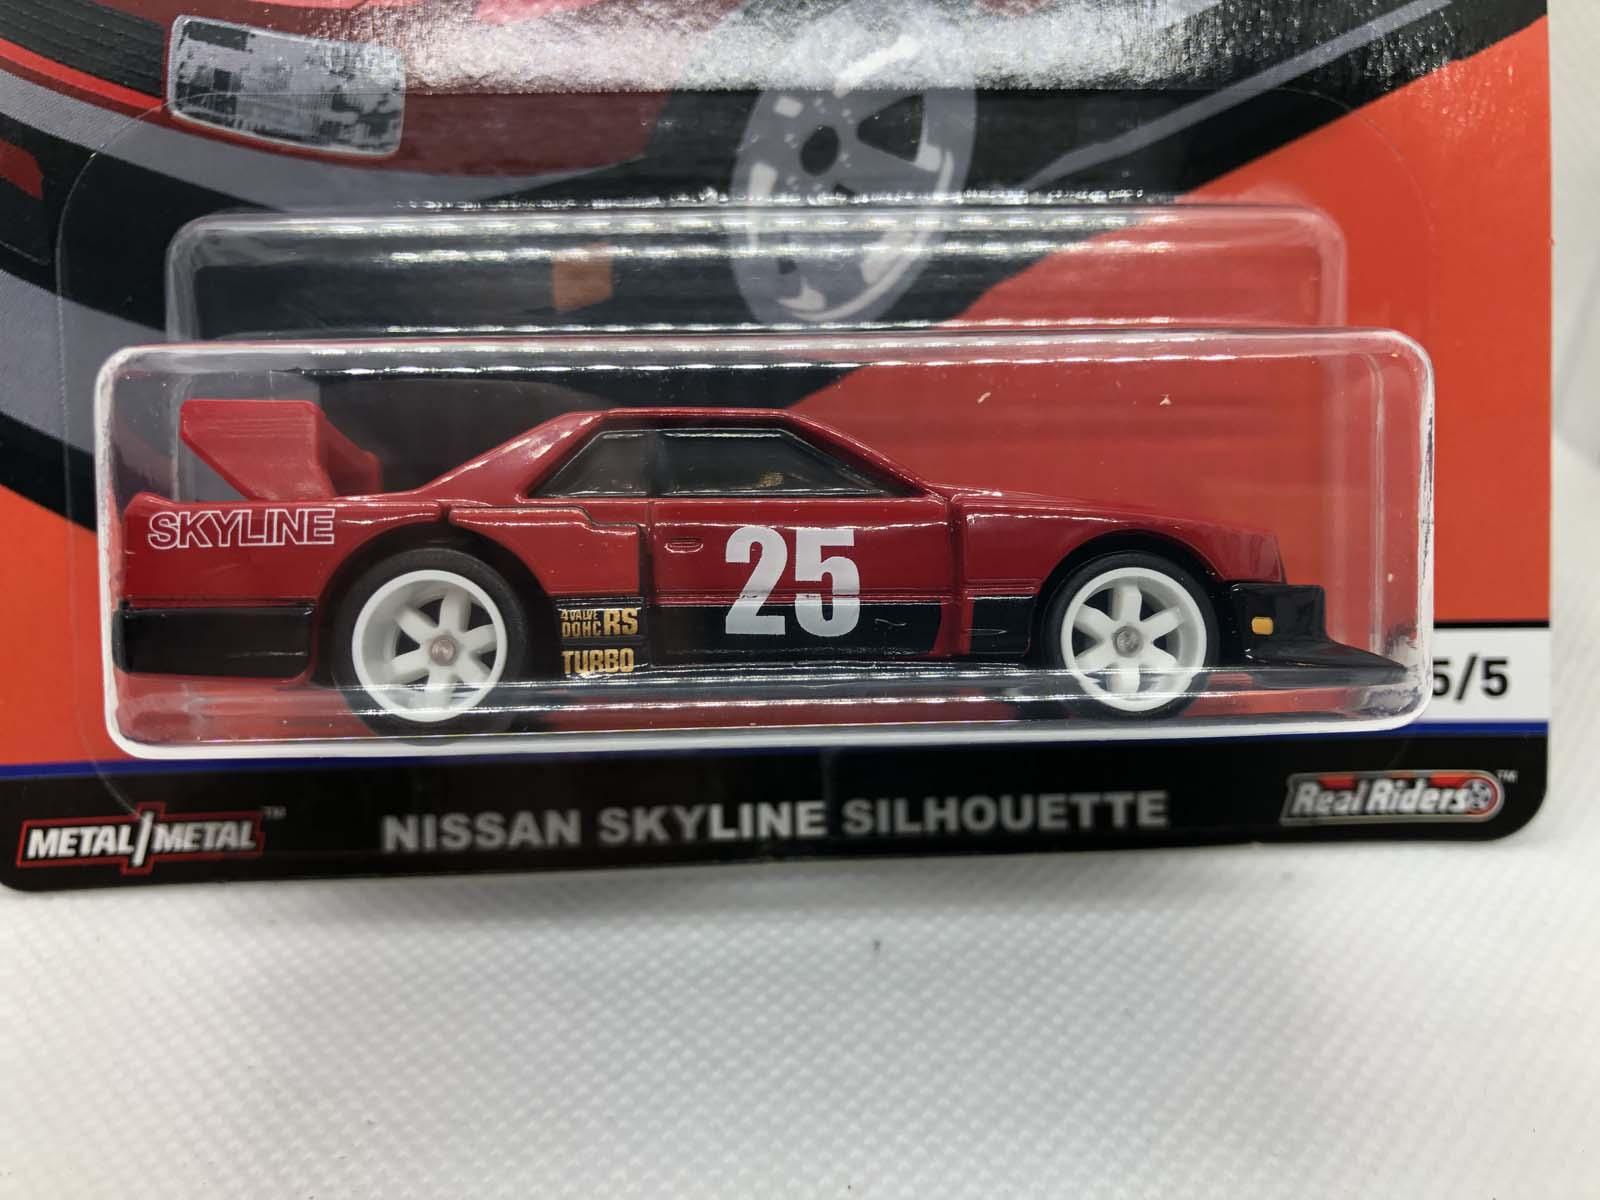 Nissan Skyline Silhouette